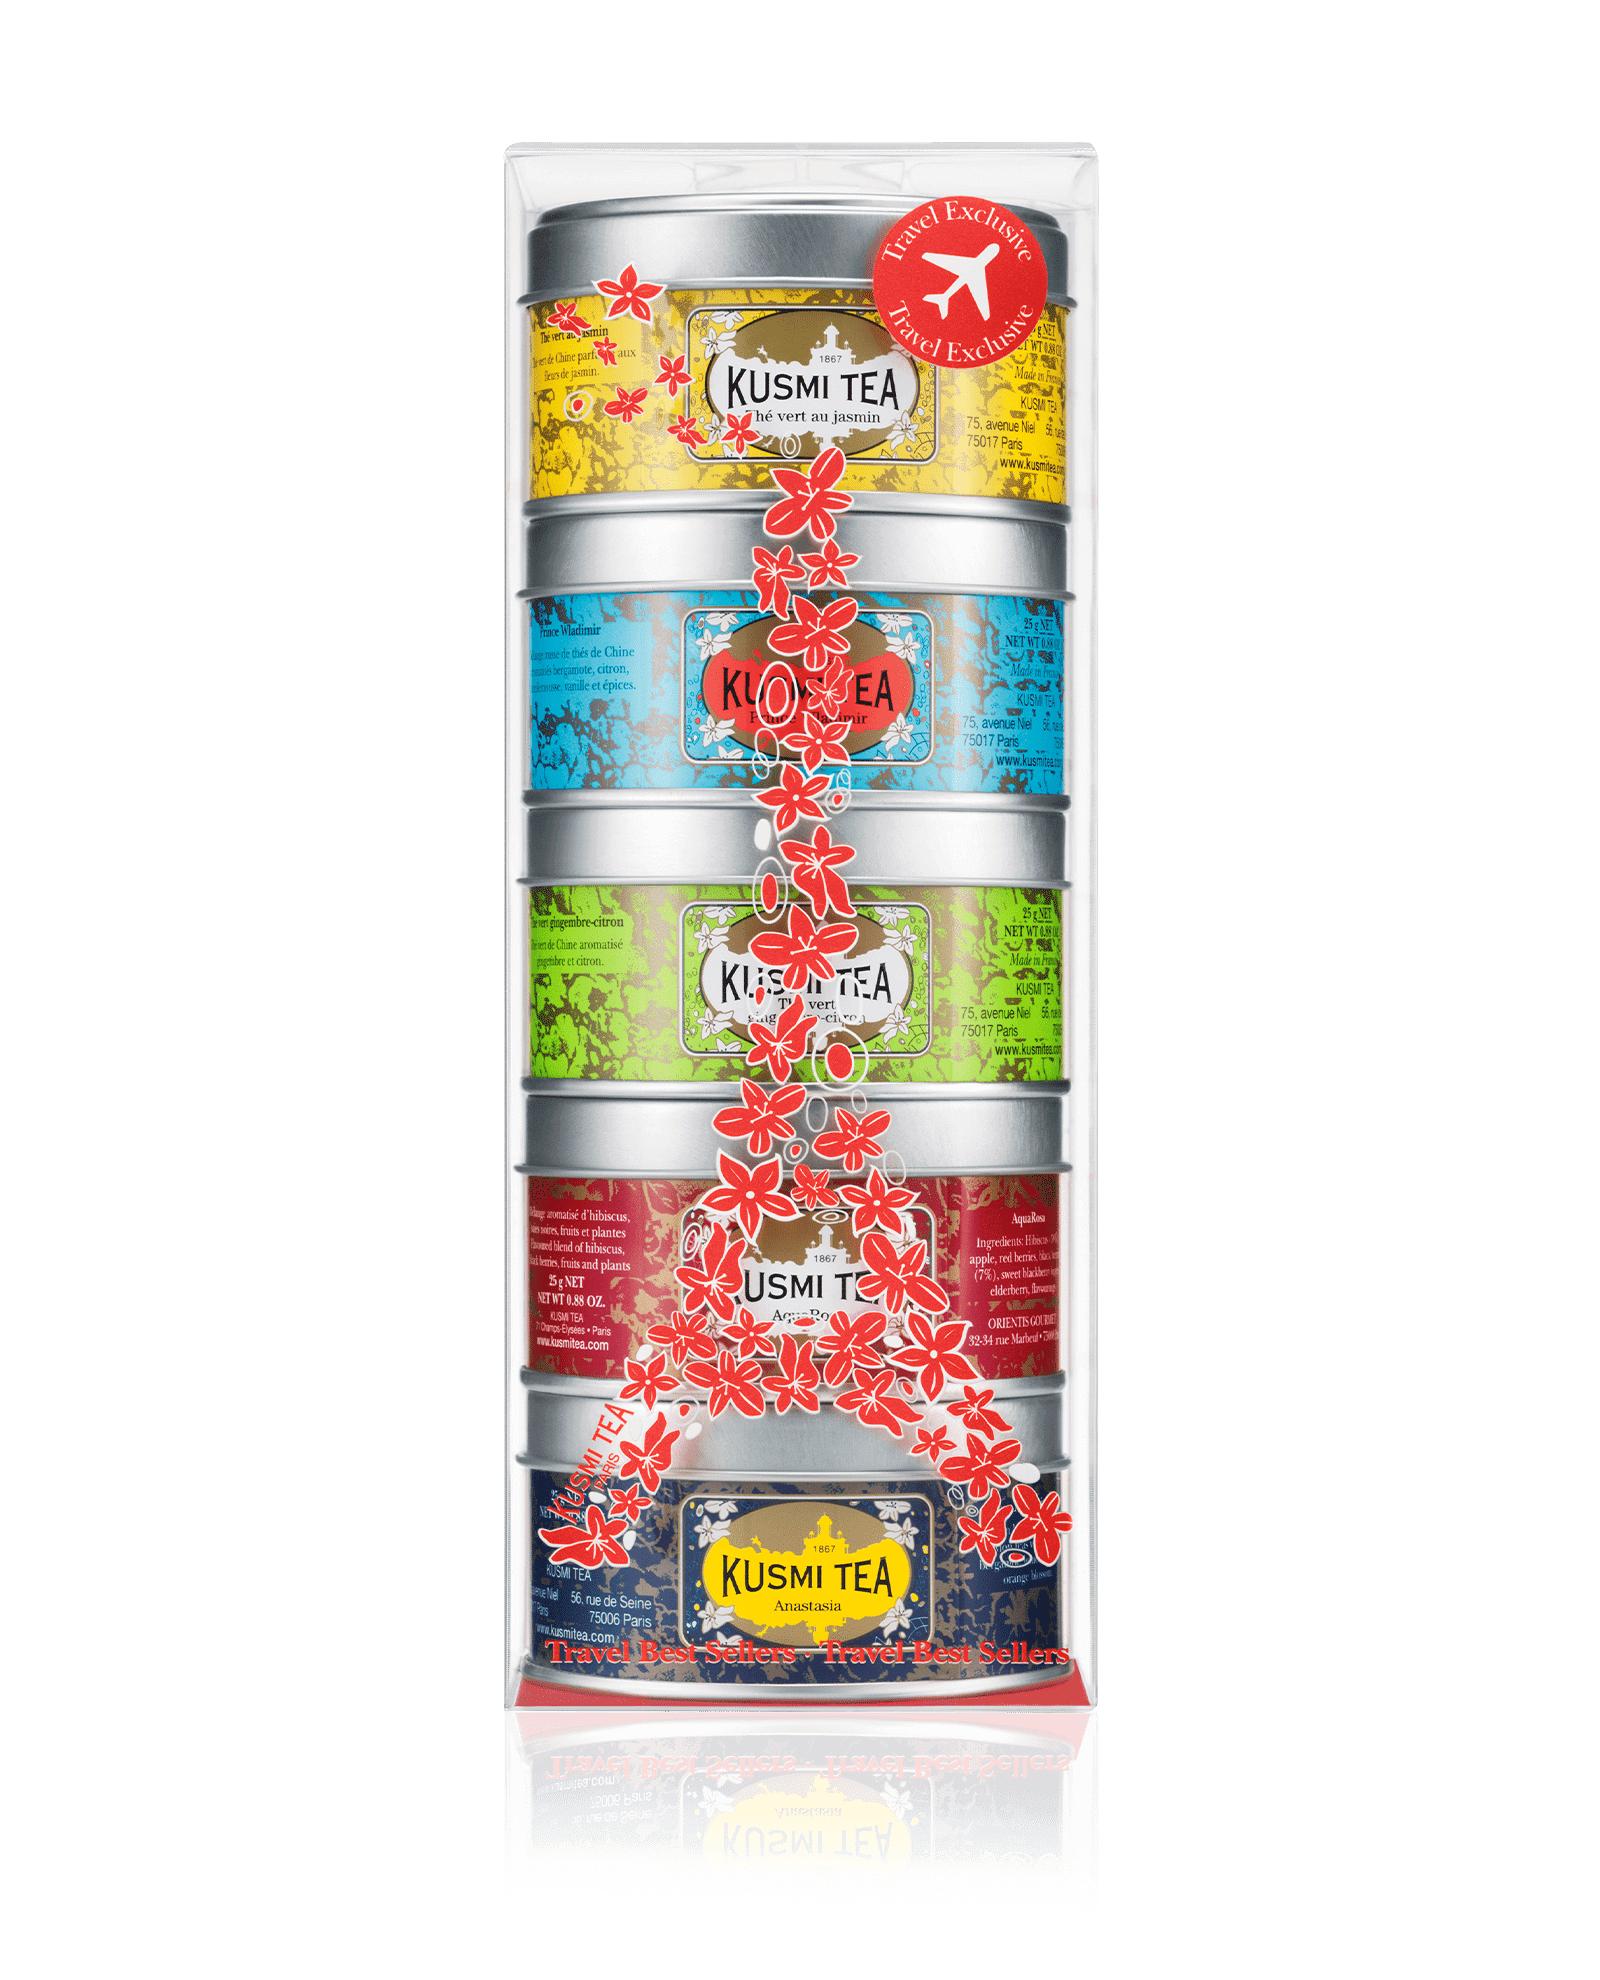 KUSMI TEA Assortiment Miniatures - Travel Best Sellers - Coffret de 5 miniatures de thés aromatisés et infusion - Kusmi Tea